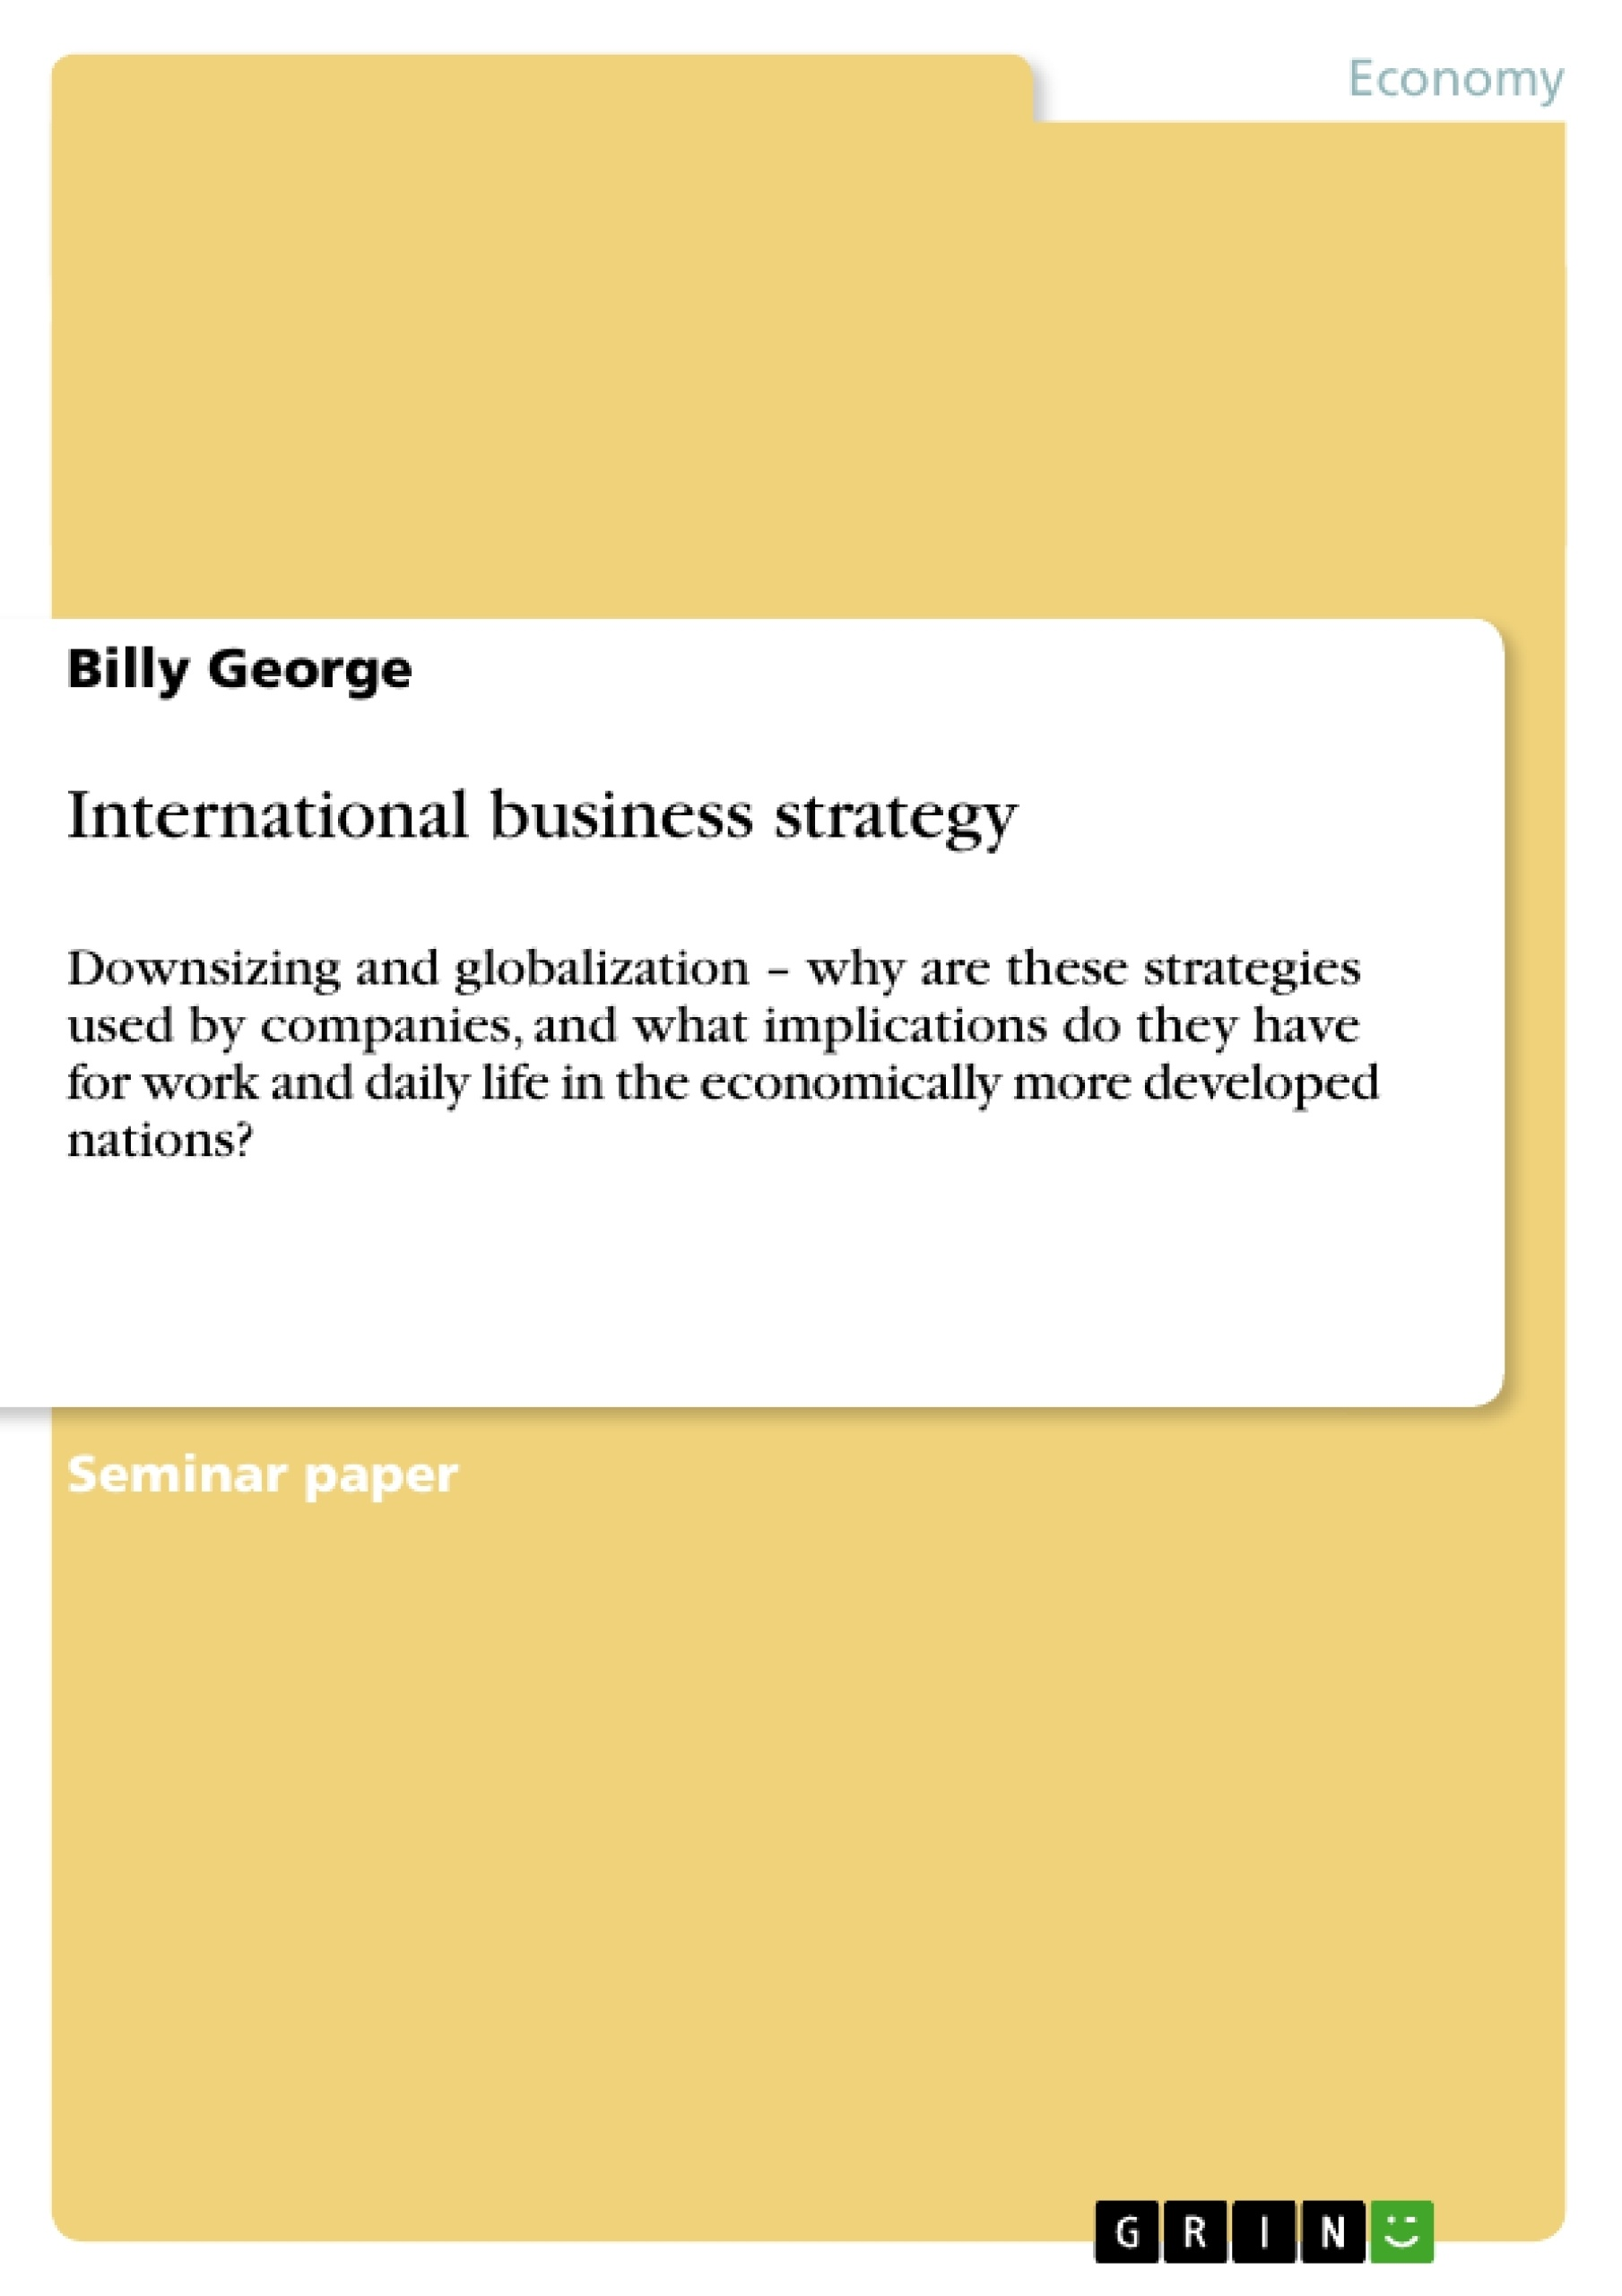 Title: International business strategy